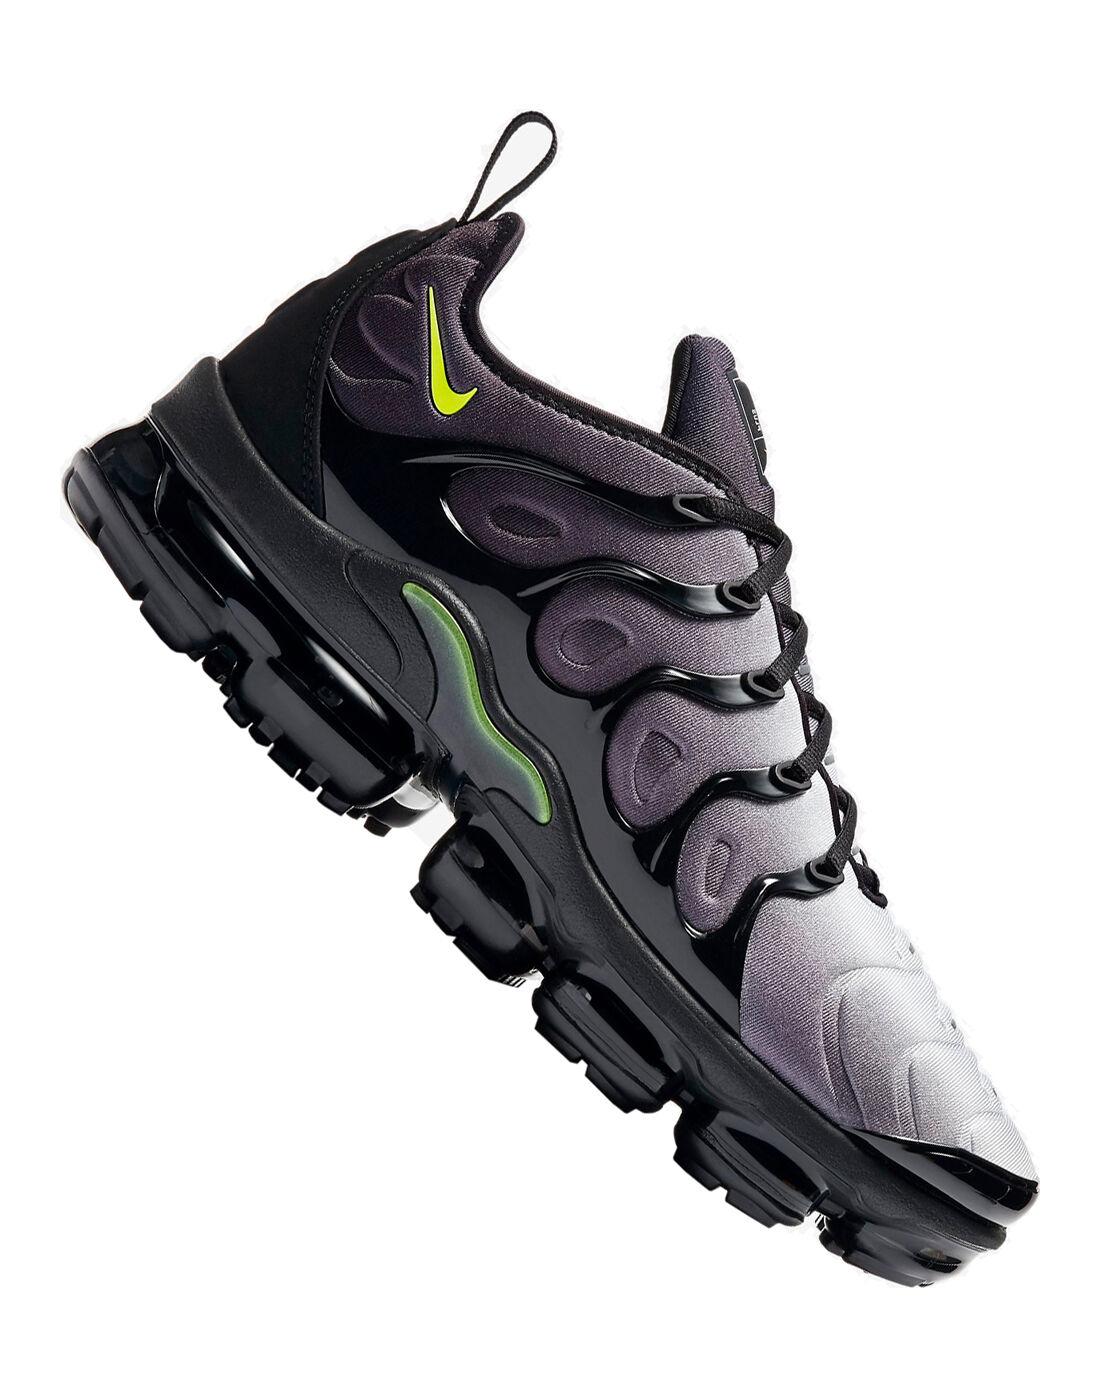 Nike Air VaporMax Plus | Neon 95 | Life